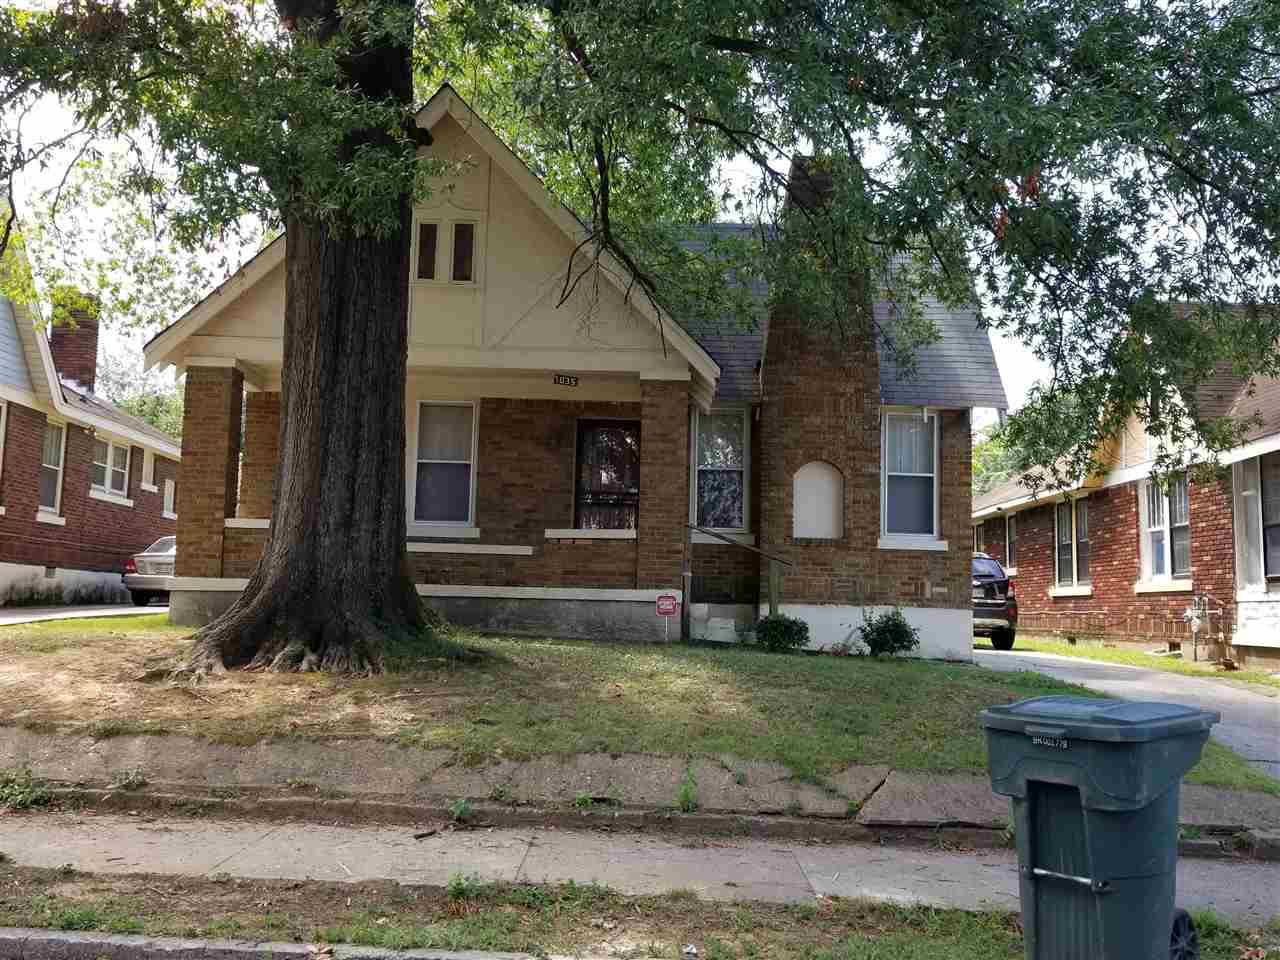 1035 MAURY ST, Memphis, TN 38107